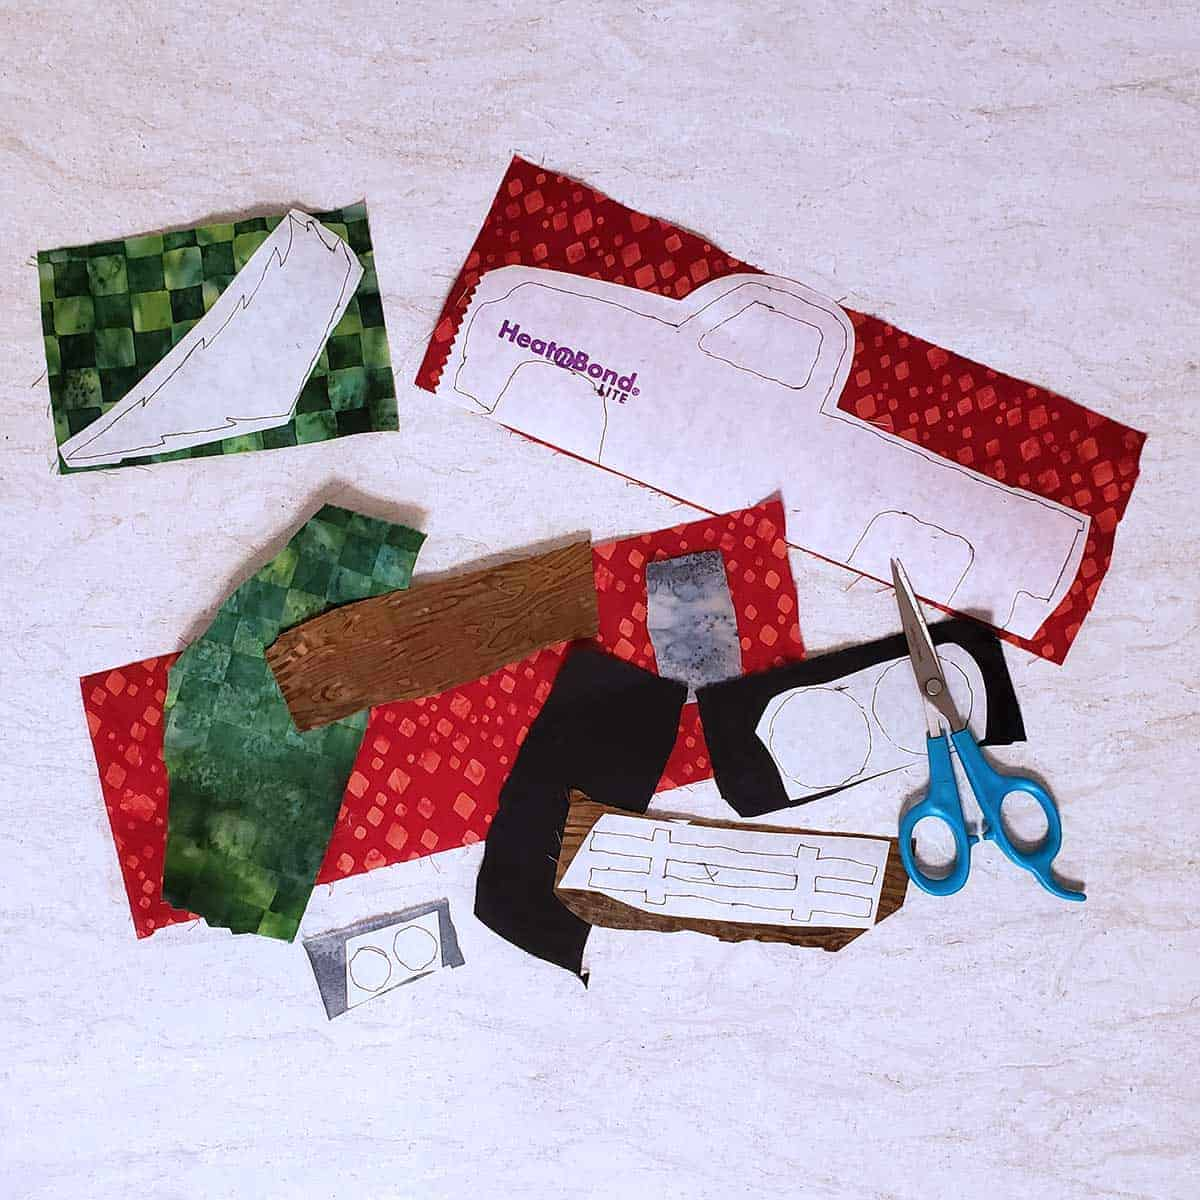 Batiks used for applique